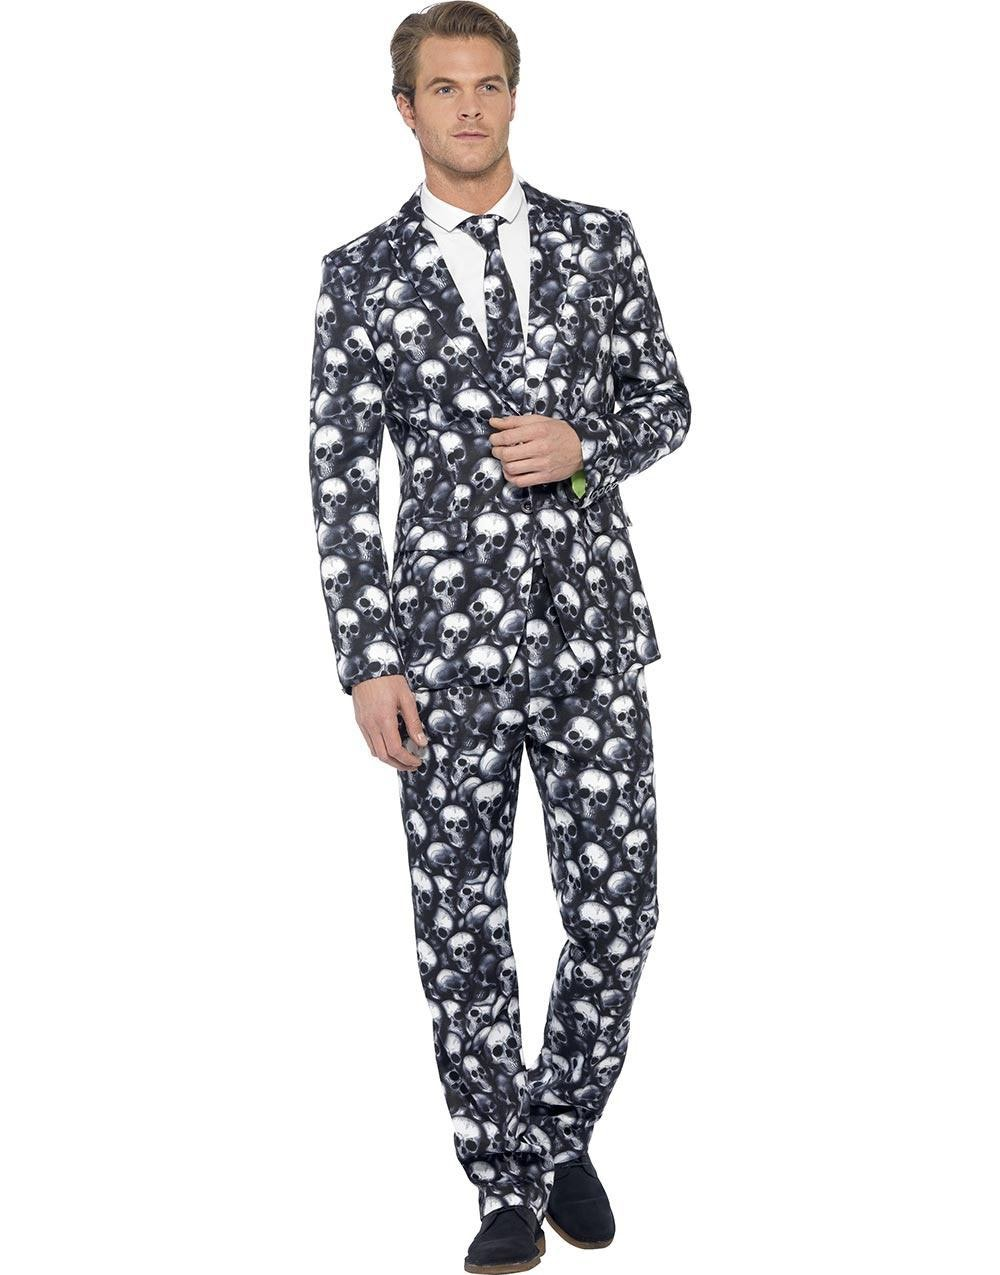 escorte lane skolepike kostyme